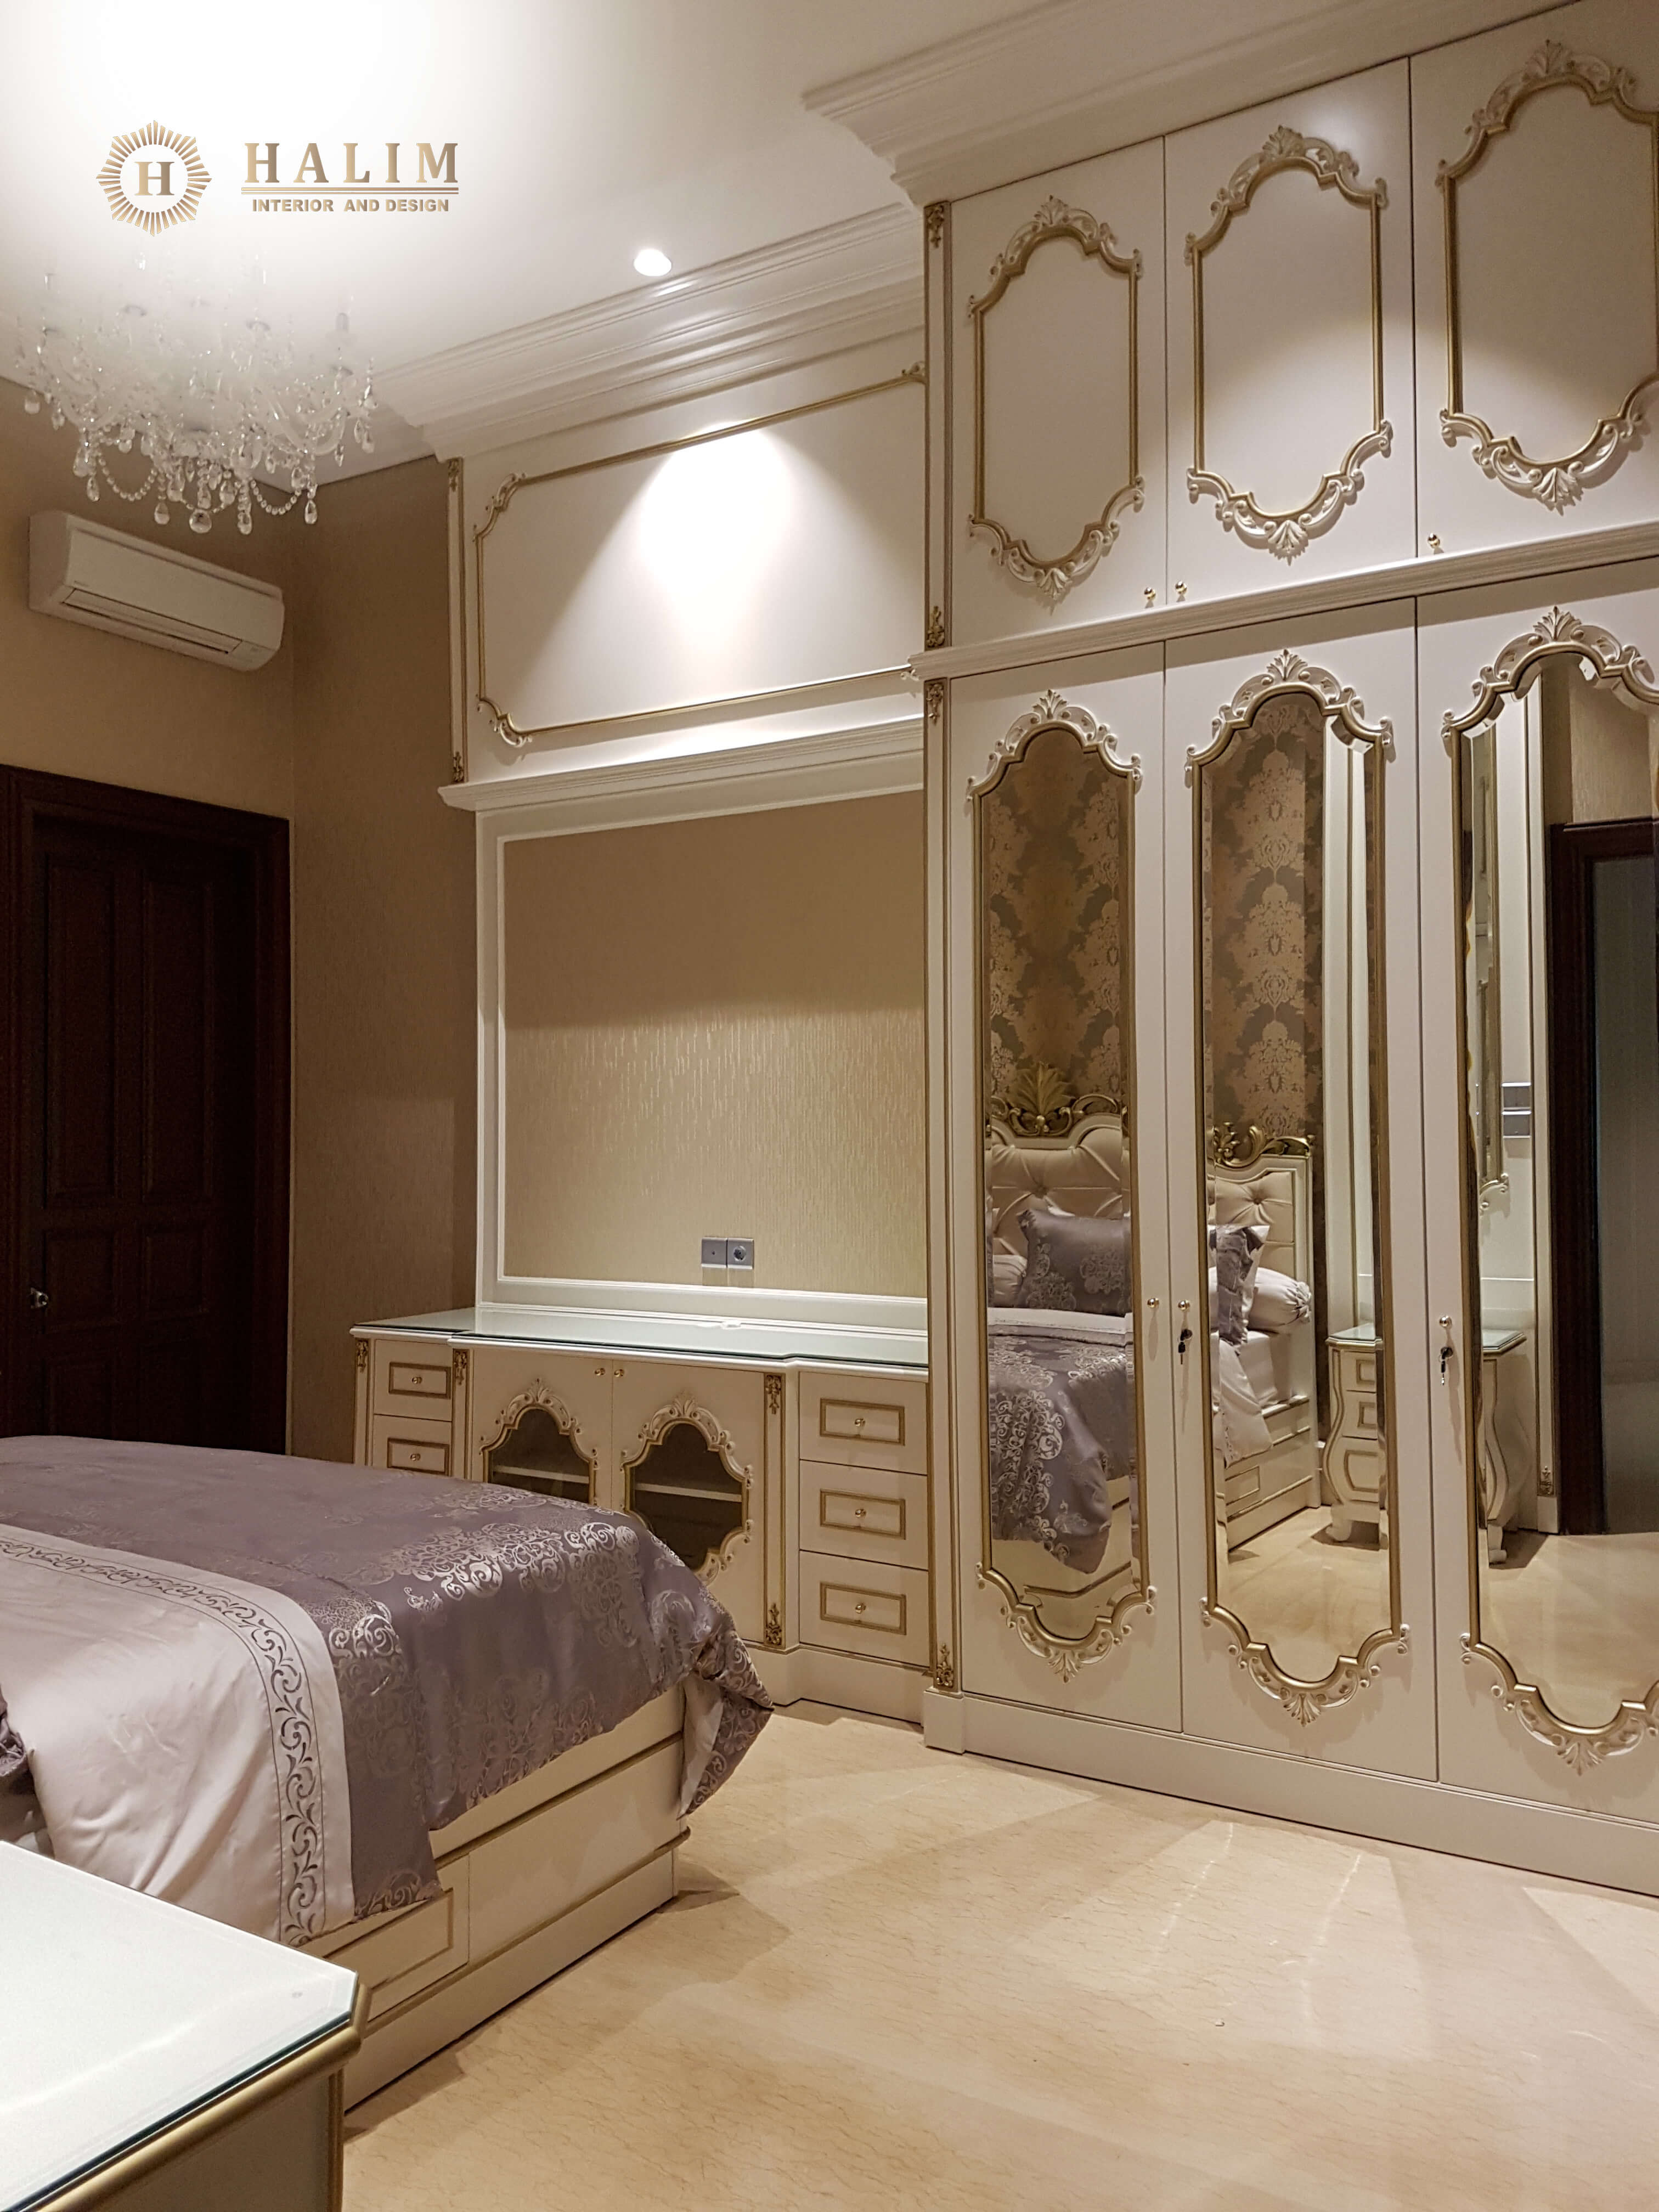 Halim, Interior, modern, furniture, contemporer american style, minimalist, european, classic, surabaya, Taman Hunian Satelit 10. Almari Kamar Tamu